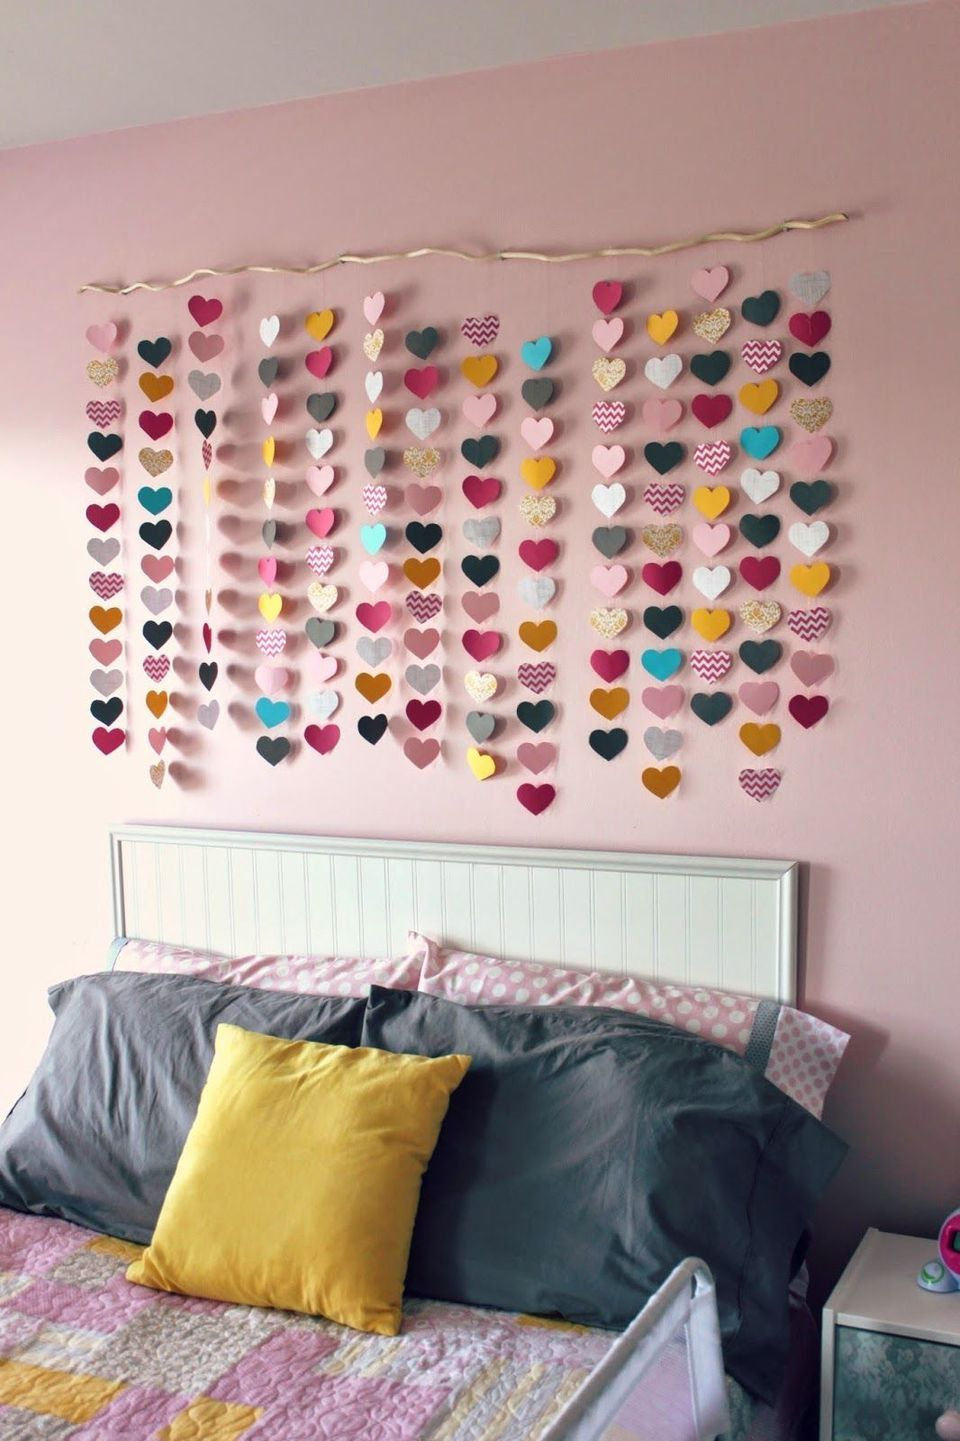 24 Wall Decor Ideas For Girls Rooms Girls Wall Decor Room Diy